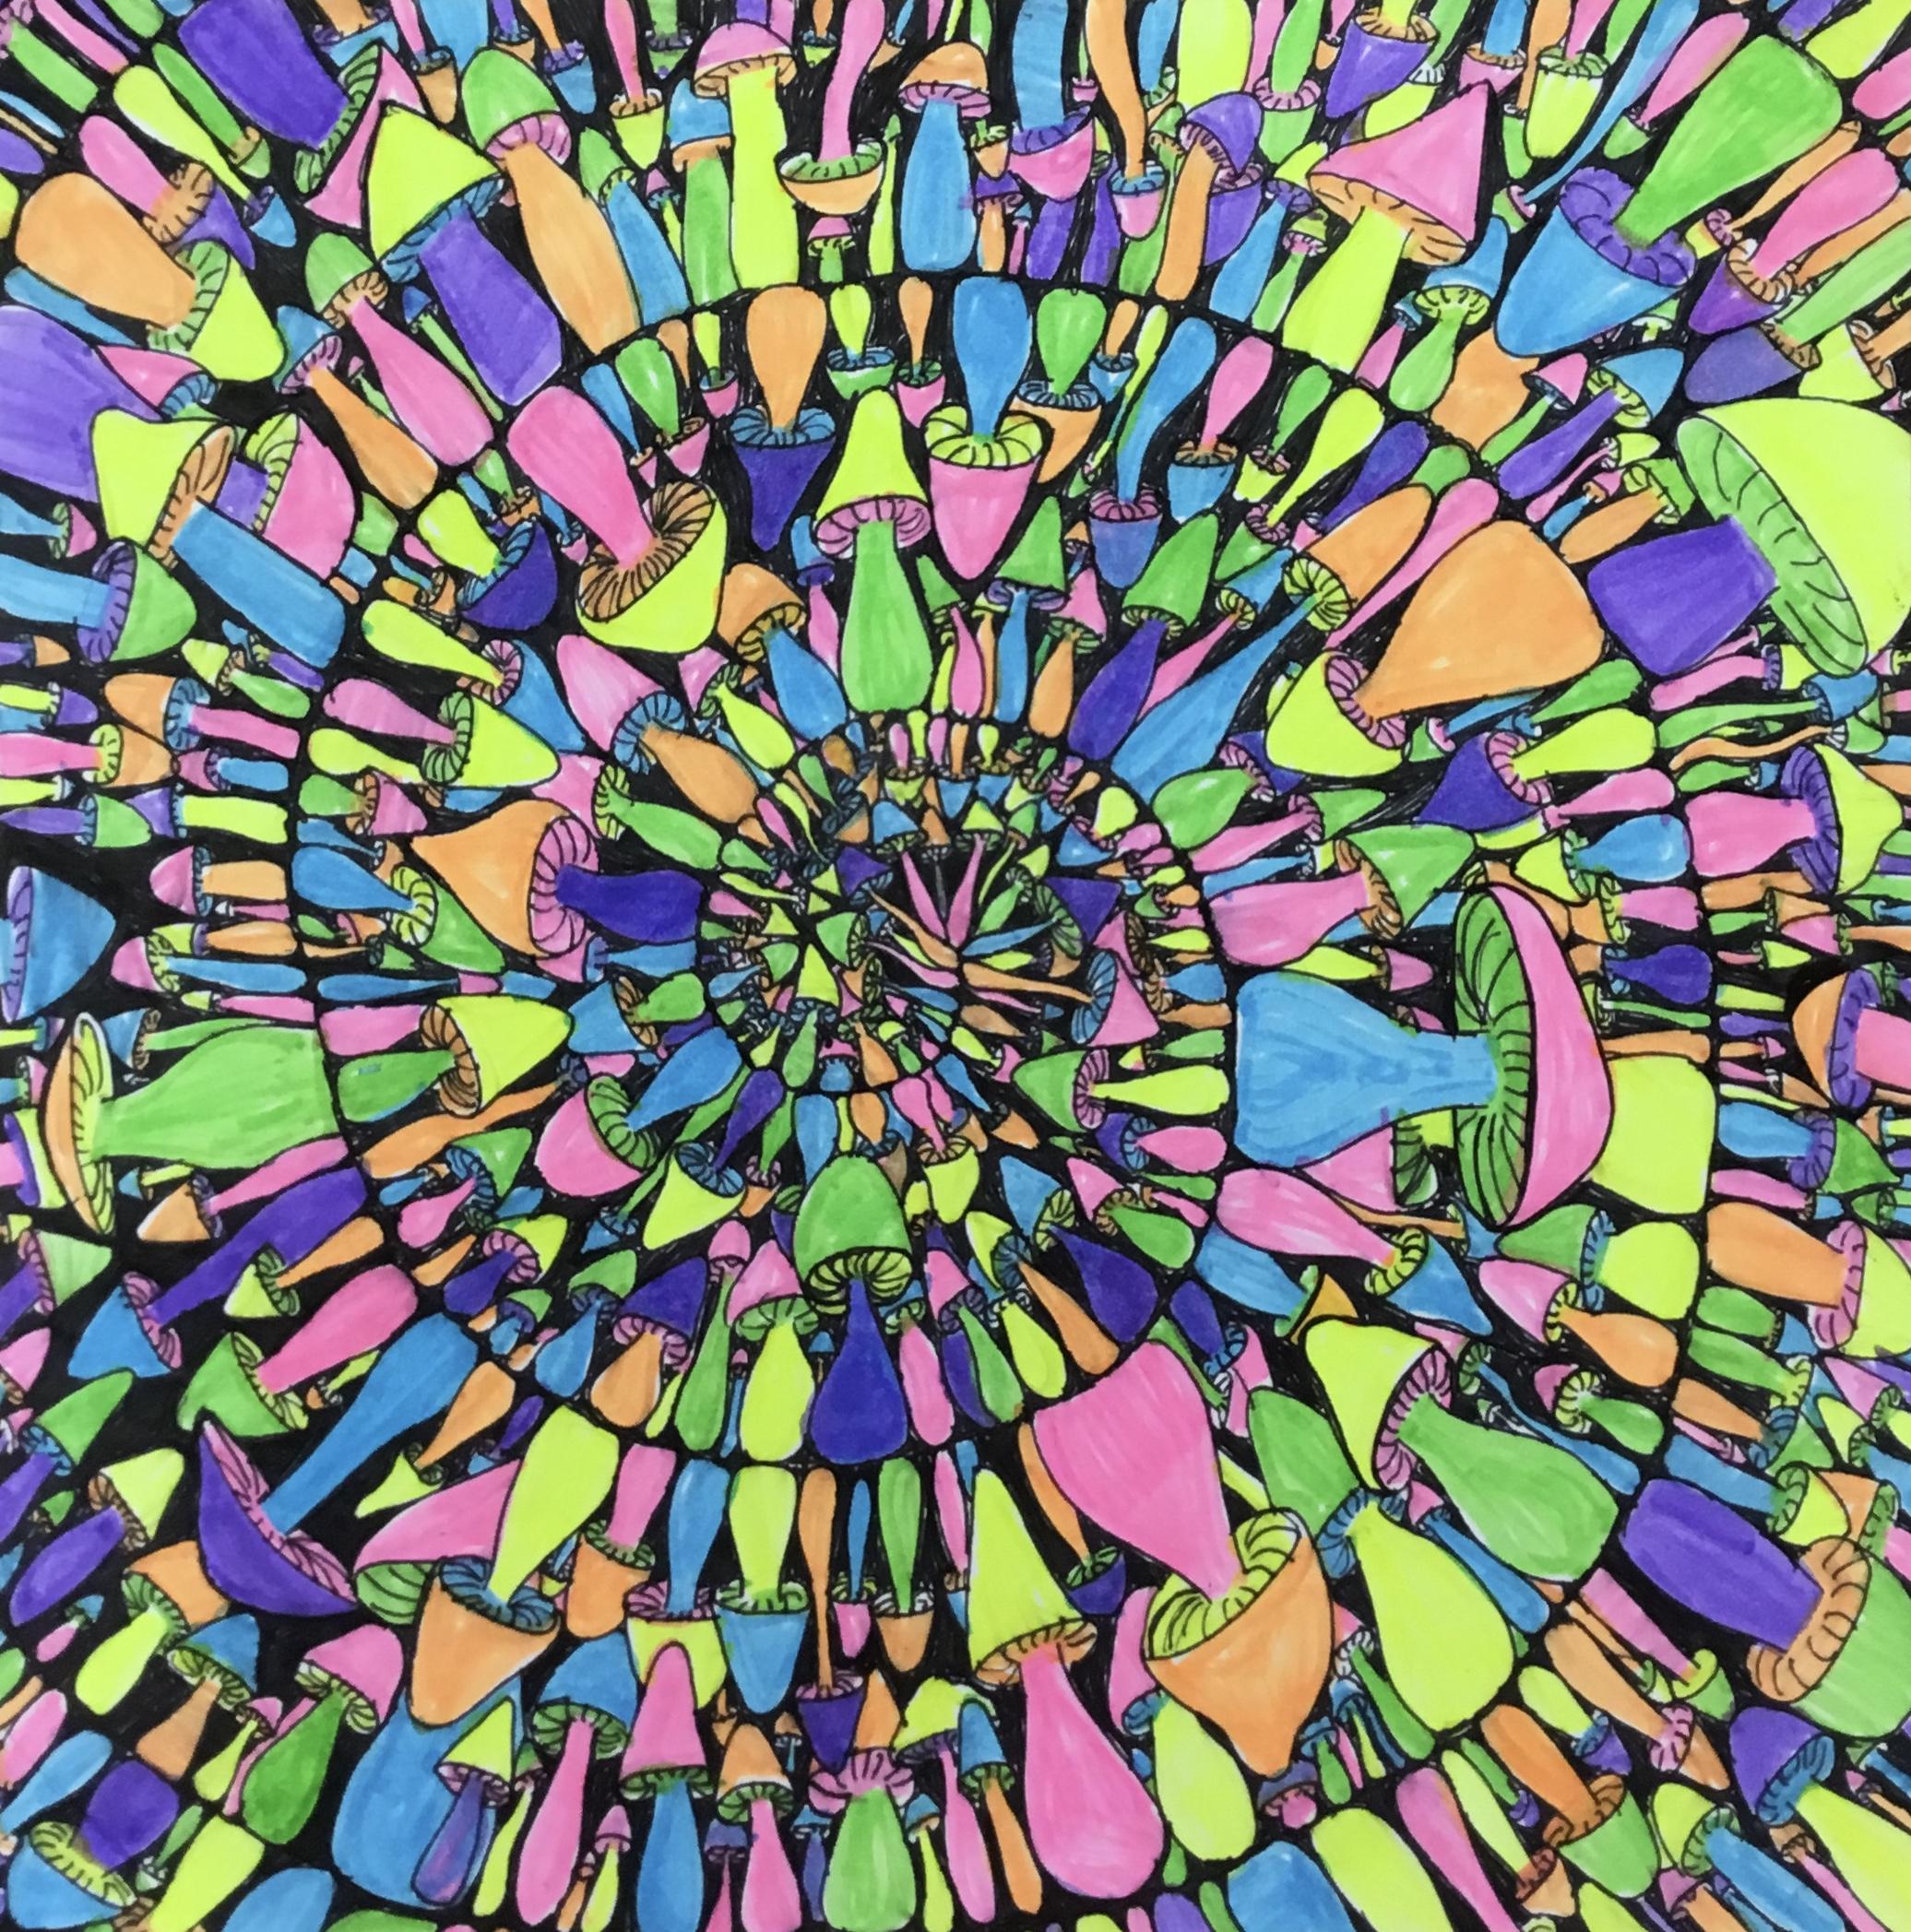 colorful mushroom spiral drawing